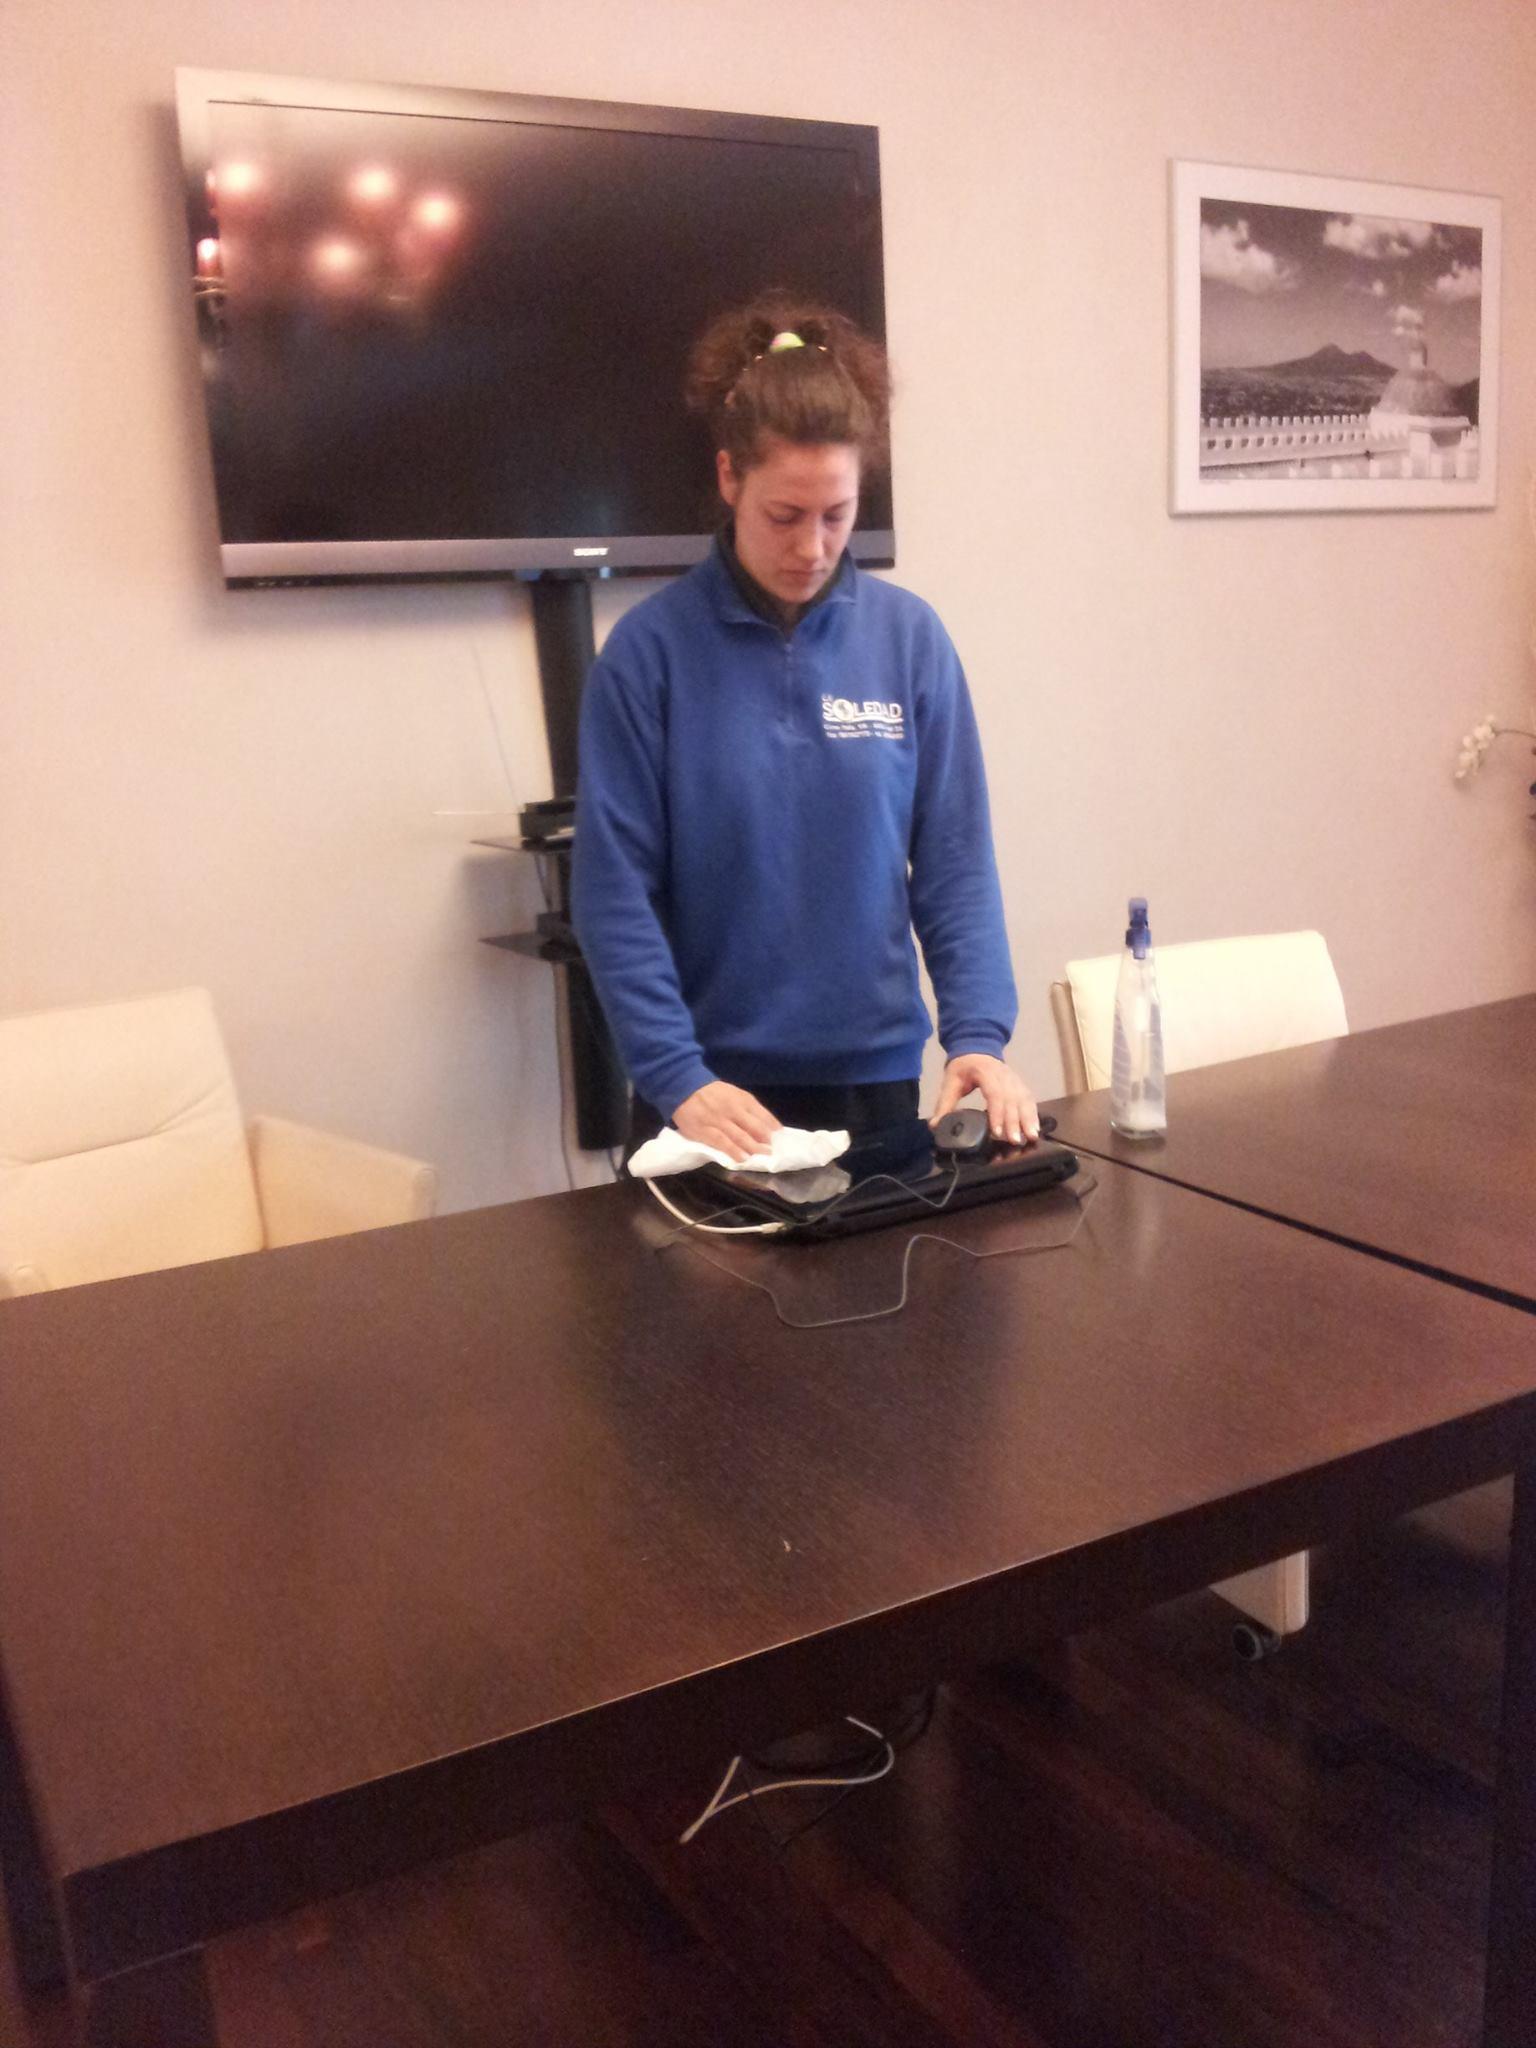 Ragazza mora con felpa blu mentre pulisce tavolo